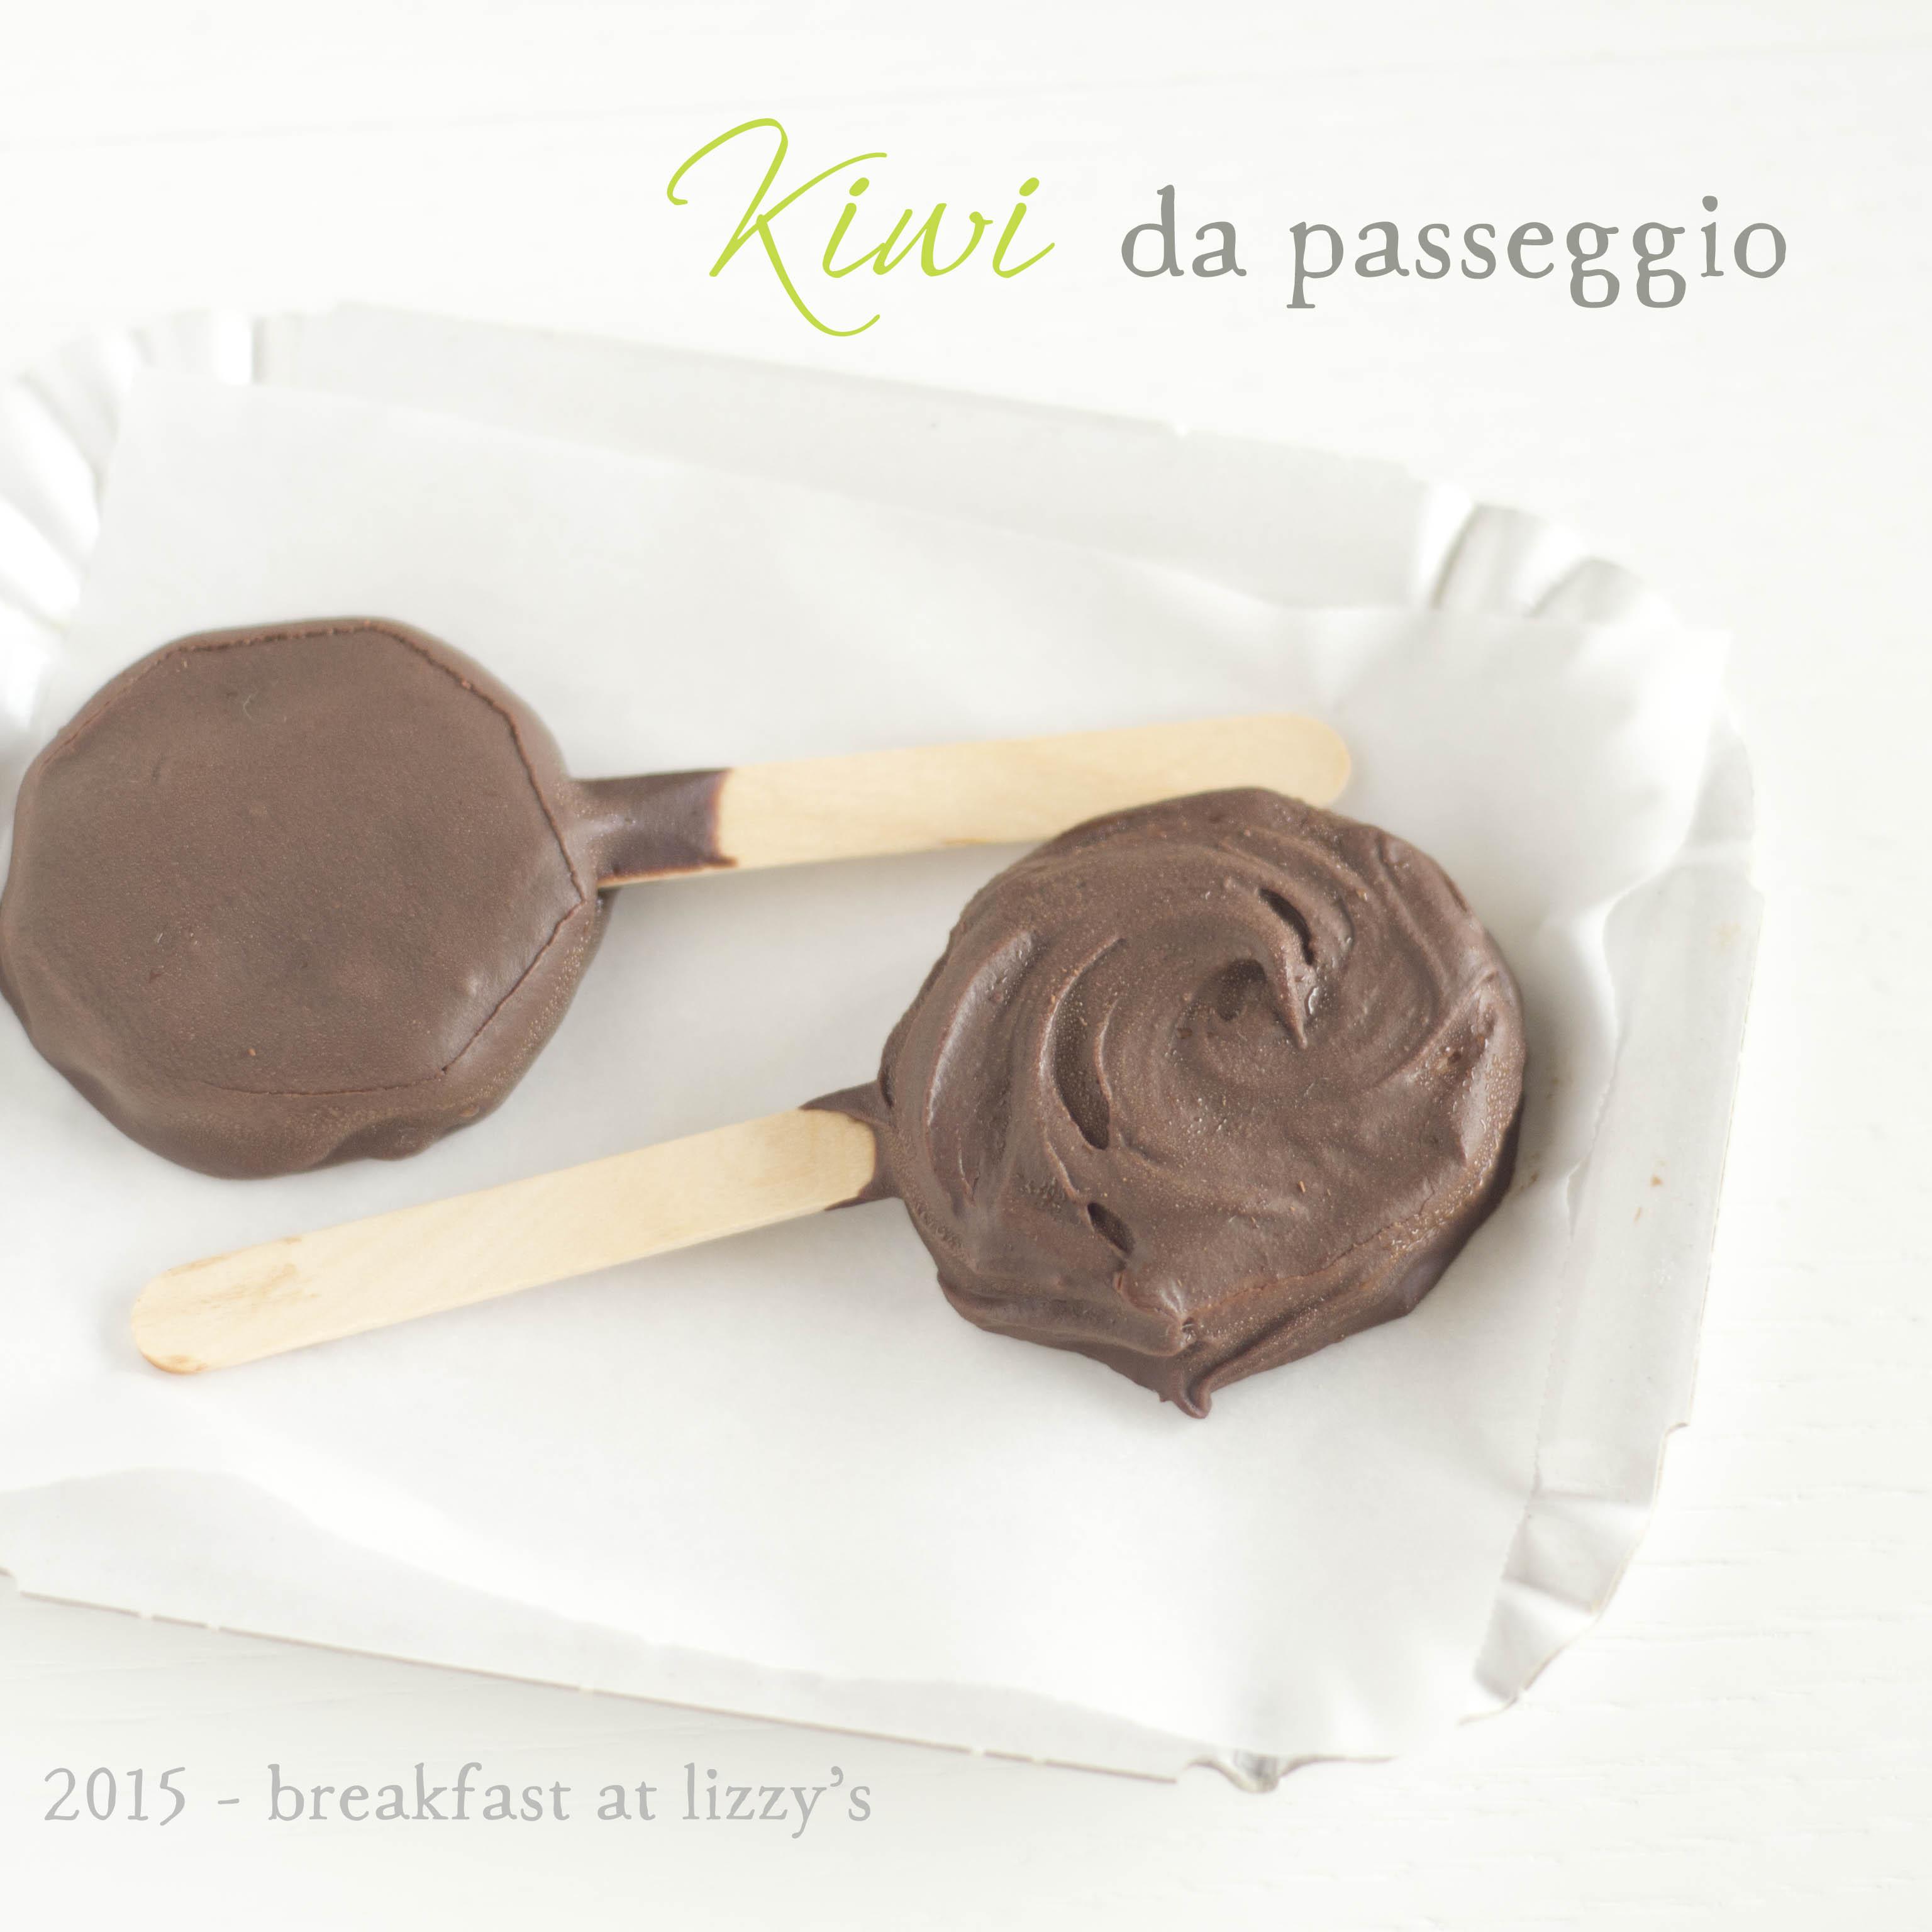 kiwi_da_passeggio_DSC_1743